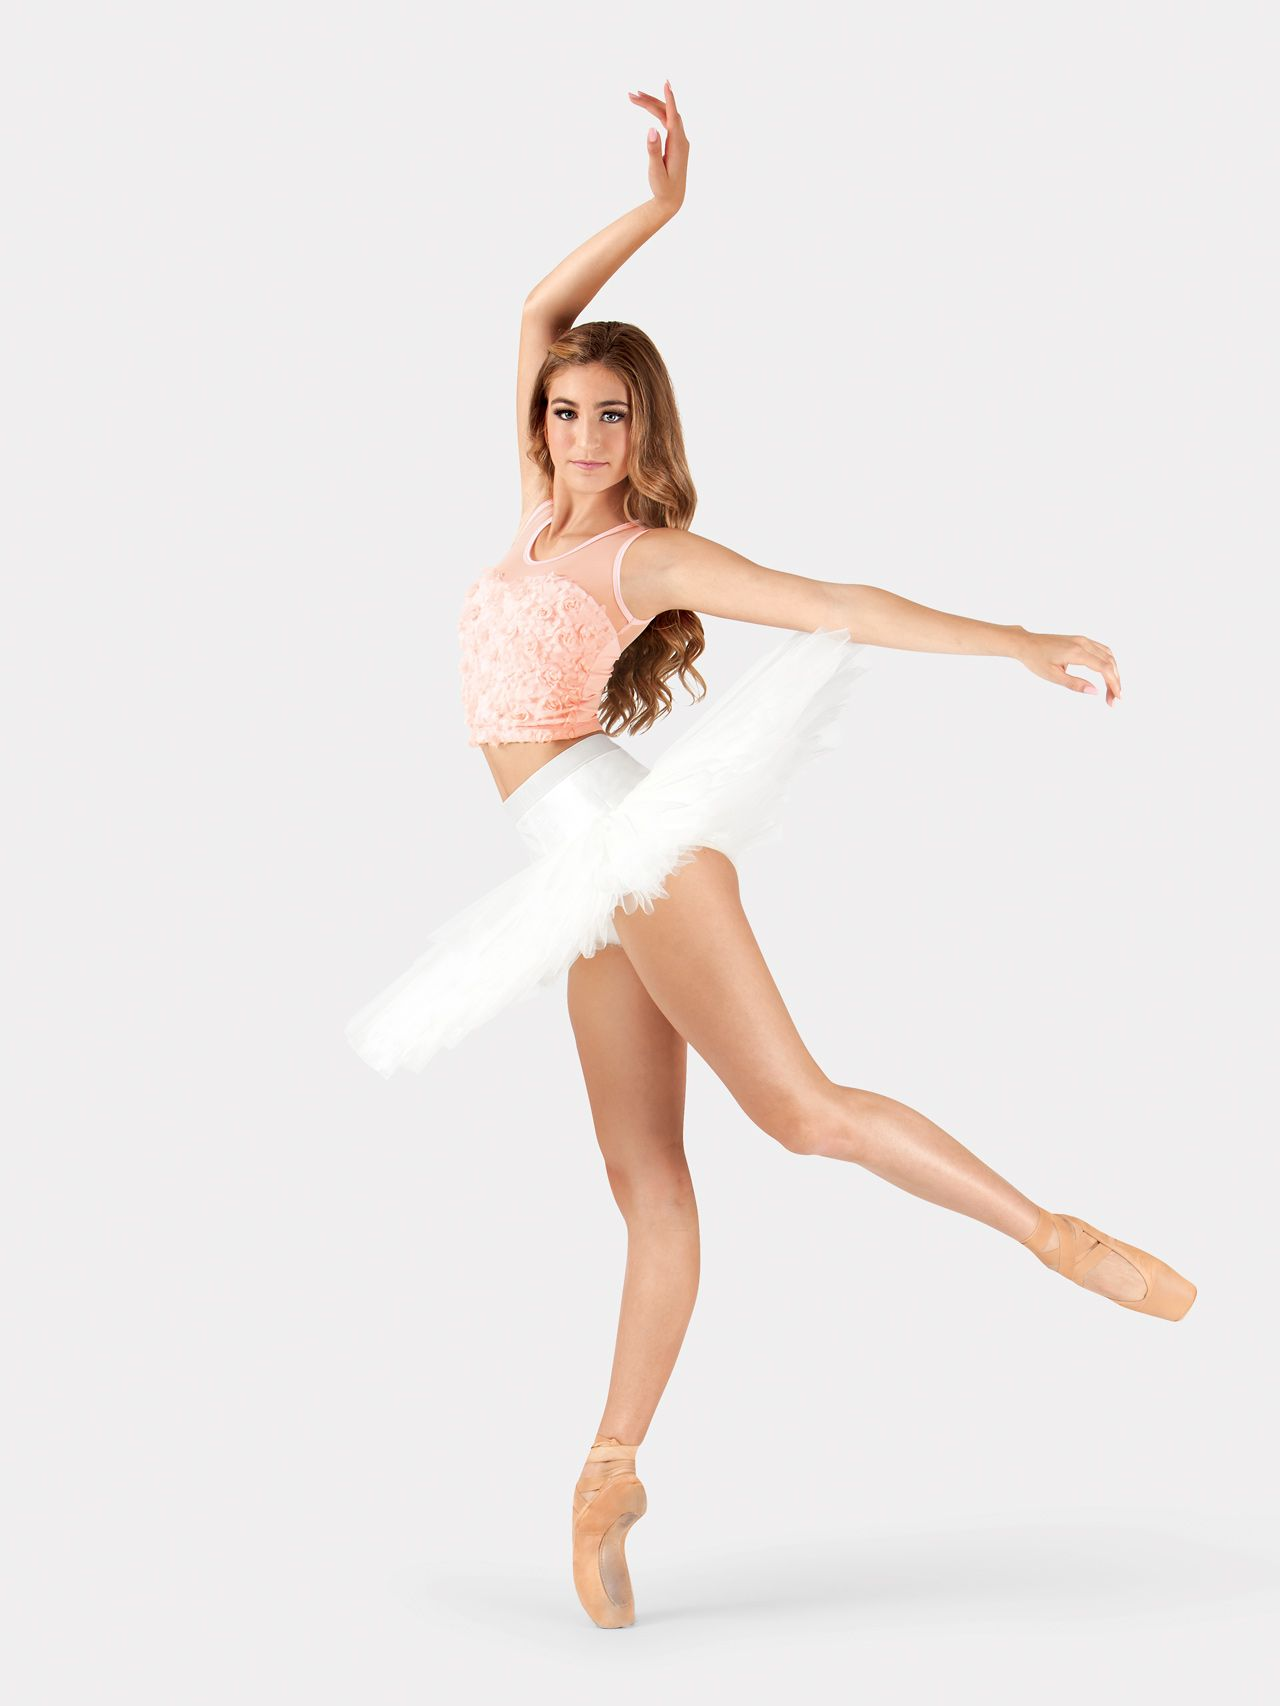 Pin On Sophia Silveria Ballet Photo Shoots